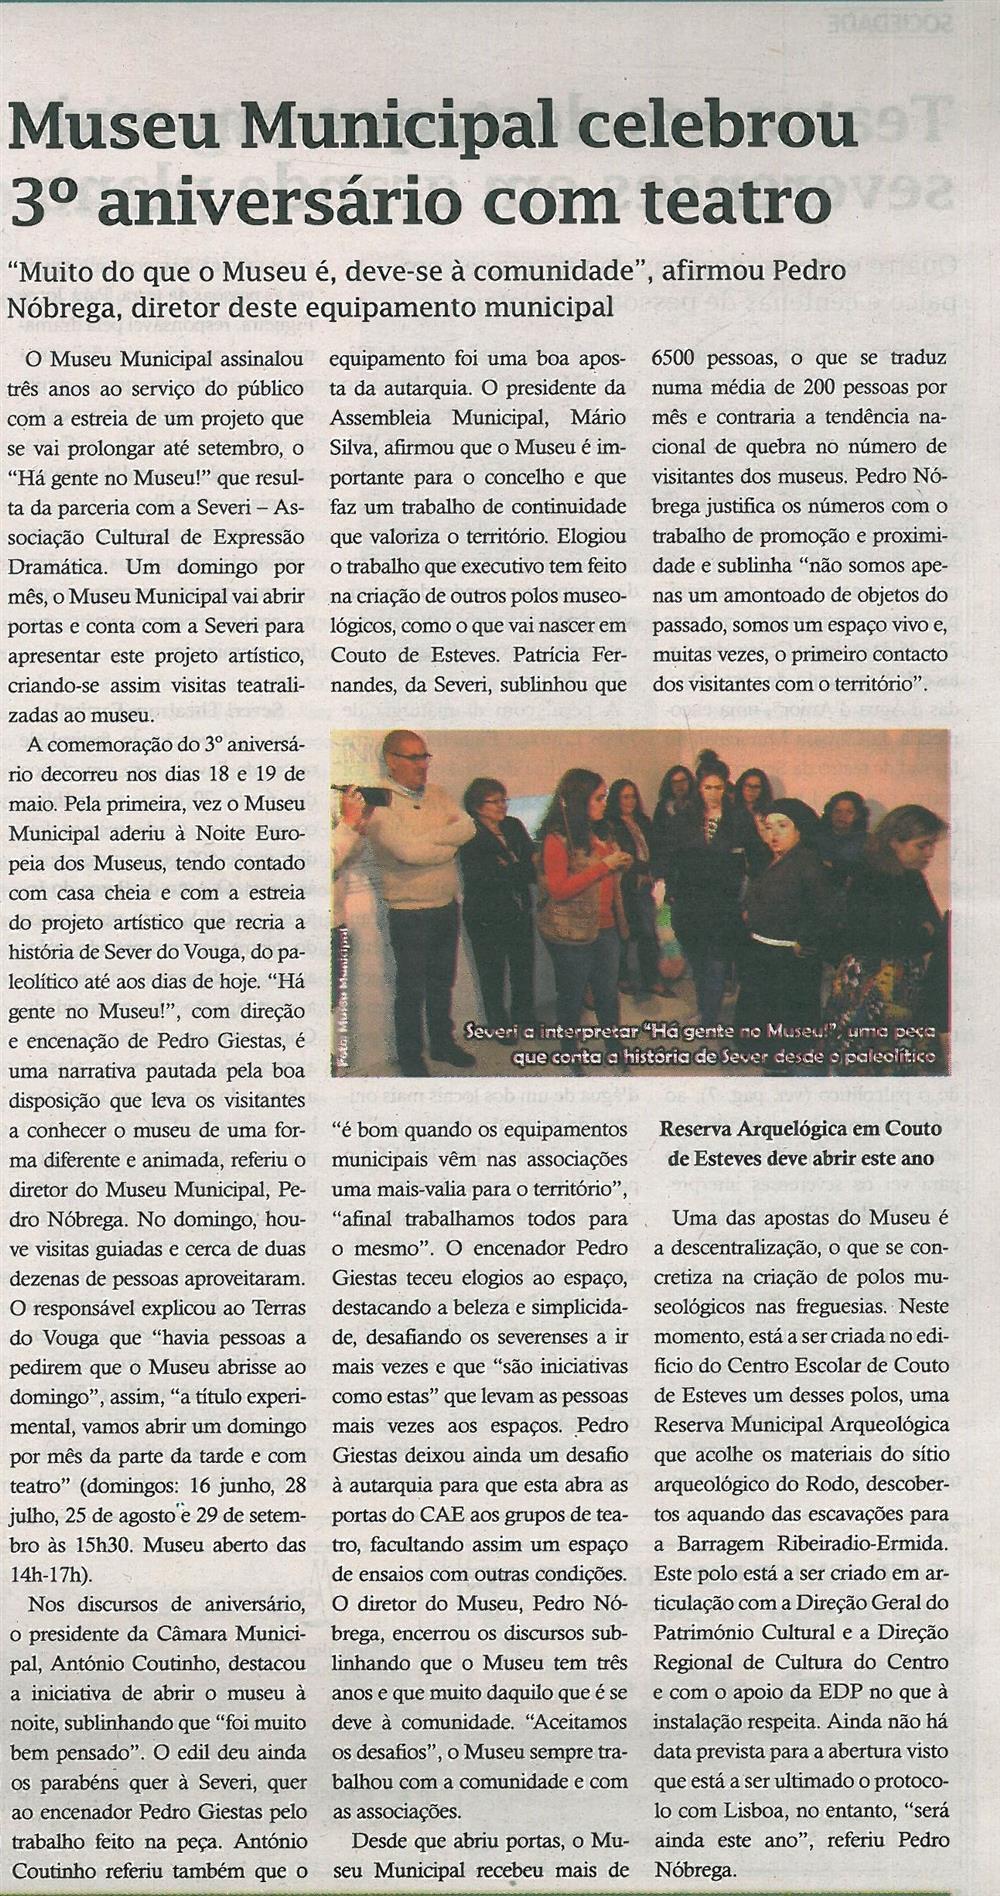 TV-jun.'19-p.7-Museu Municipal celebrou 3.º aniversário com teatro.jpg